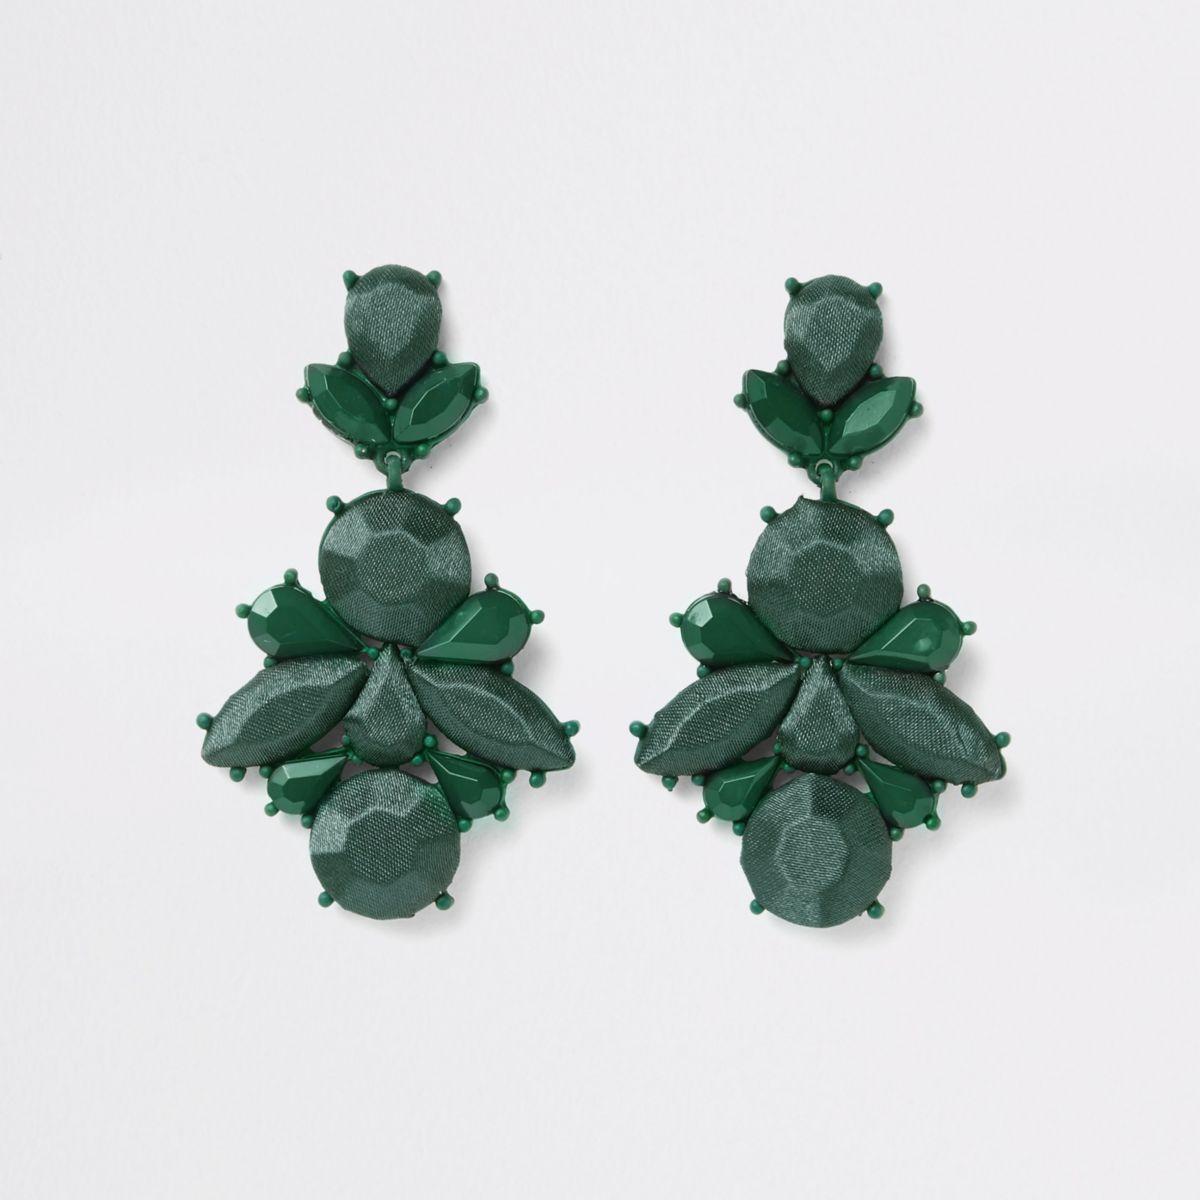 Dark green satin jewel drop earrings